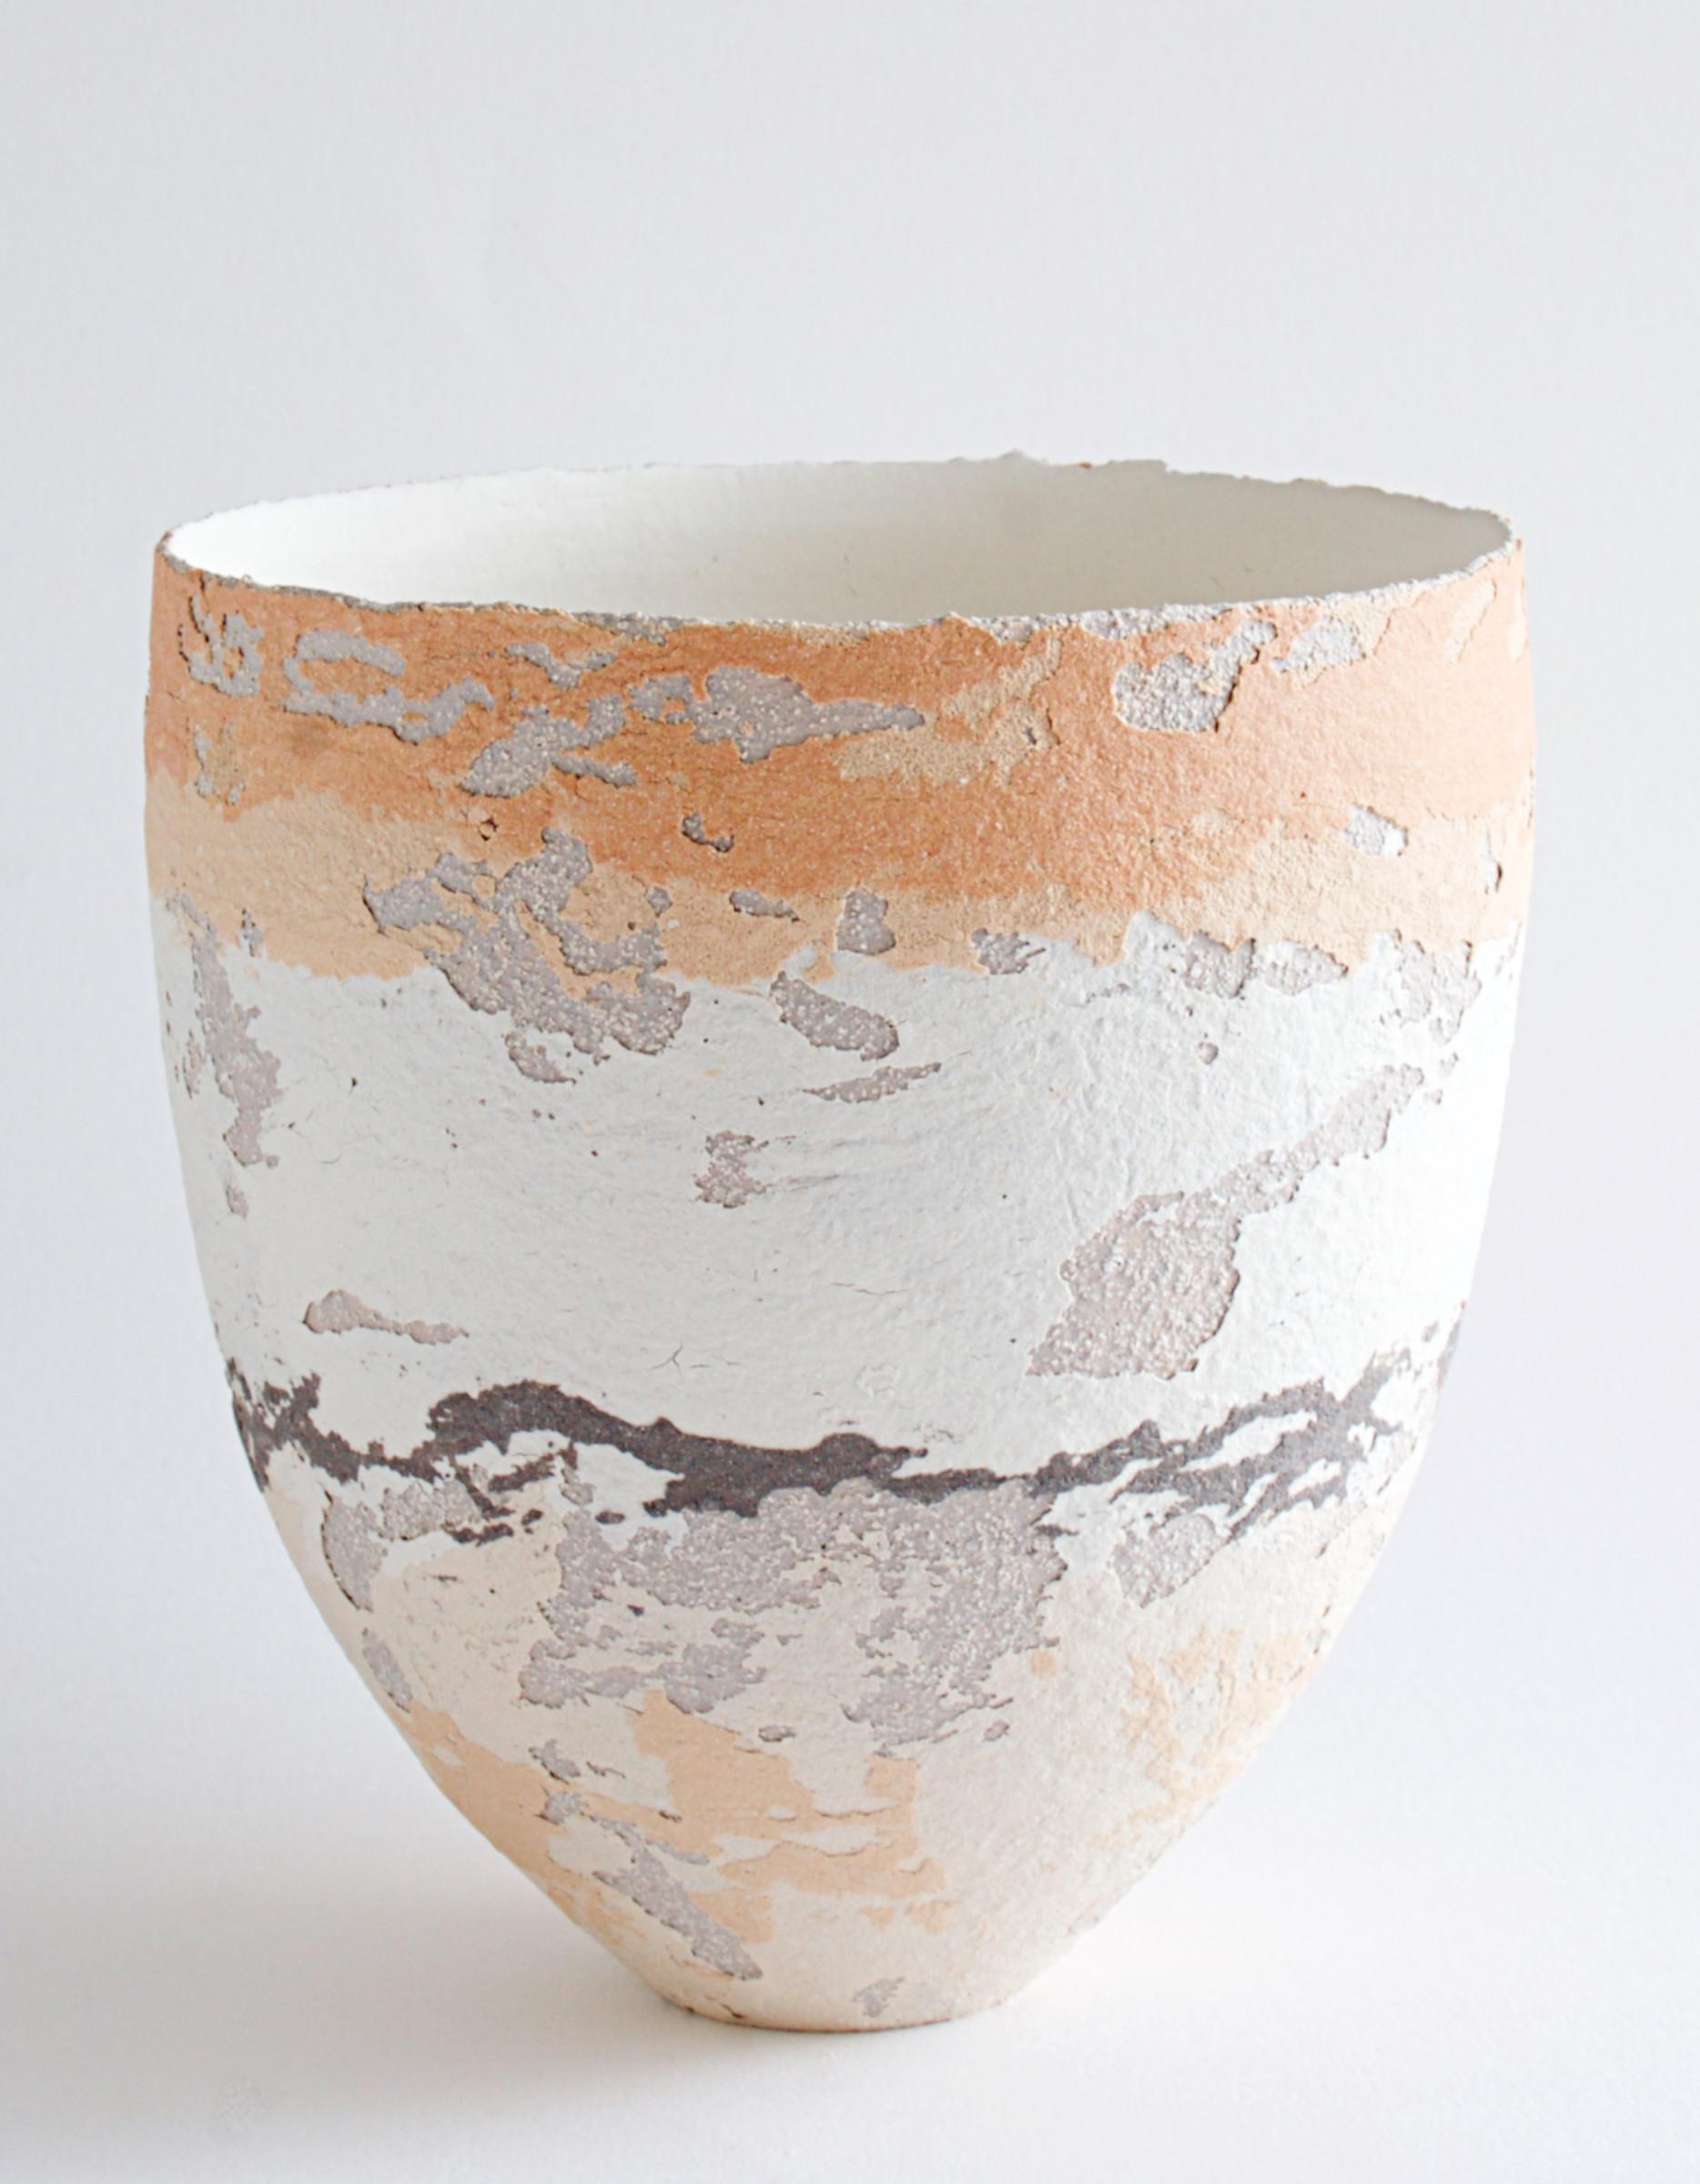 "<span class=""link fancybox-details-link""><a href=""/artists/79-clare-conrad/works/6937-clare-conrad-vessel-2020/"">View Detail Page</a></span><div class=""artist""><strong>Clare Conrad</strong></div> <div class=""title""><em>Vessel</em>, 2020</div> <div class=""medium"">Stoneware</div> <div class=""dimensions"">h. 15.5 cm </div><div class=""copyright_line"">Copyright The Artist</div>"